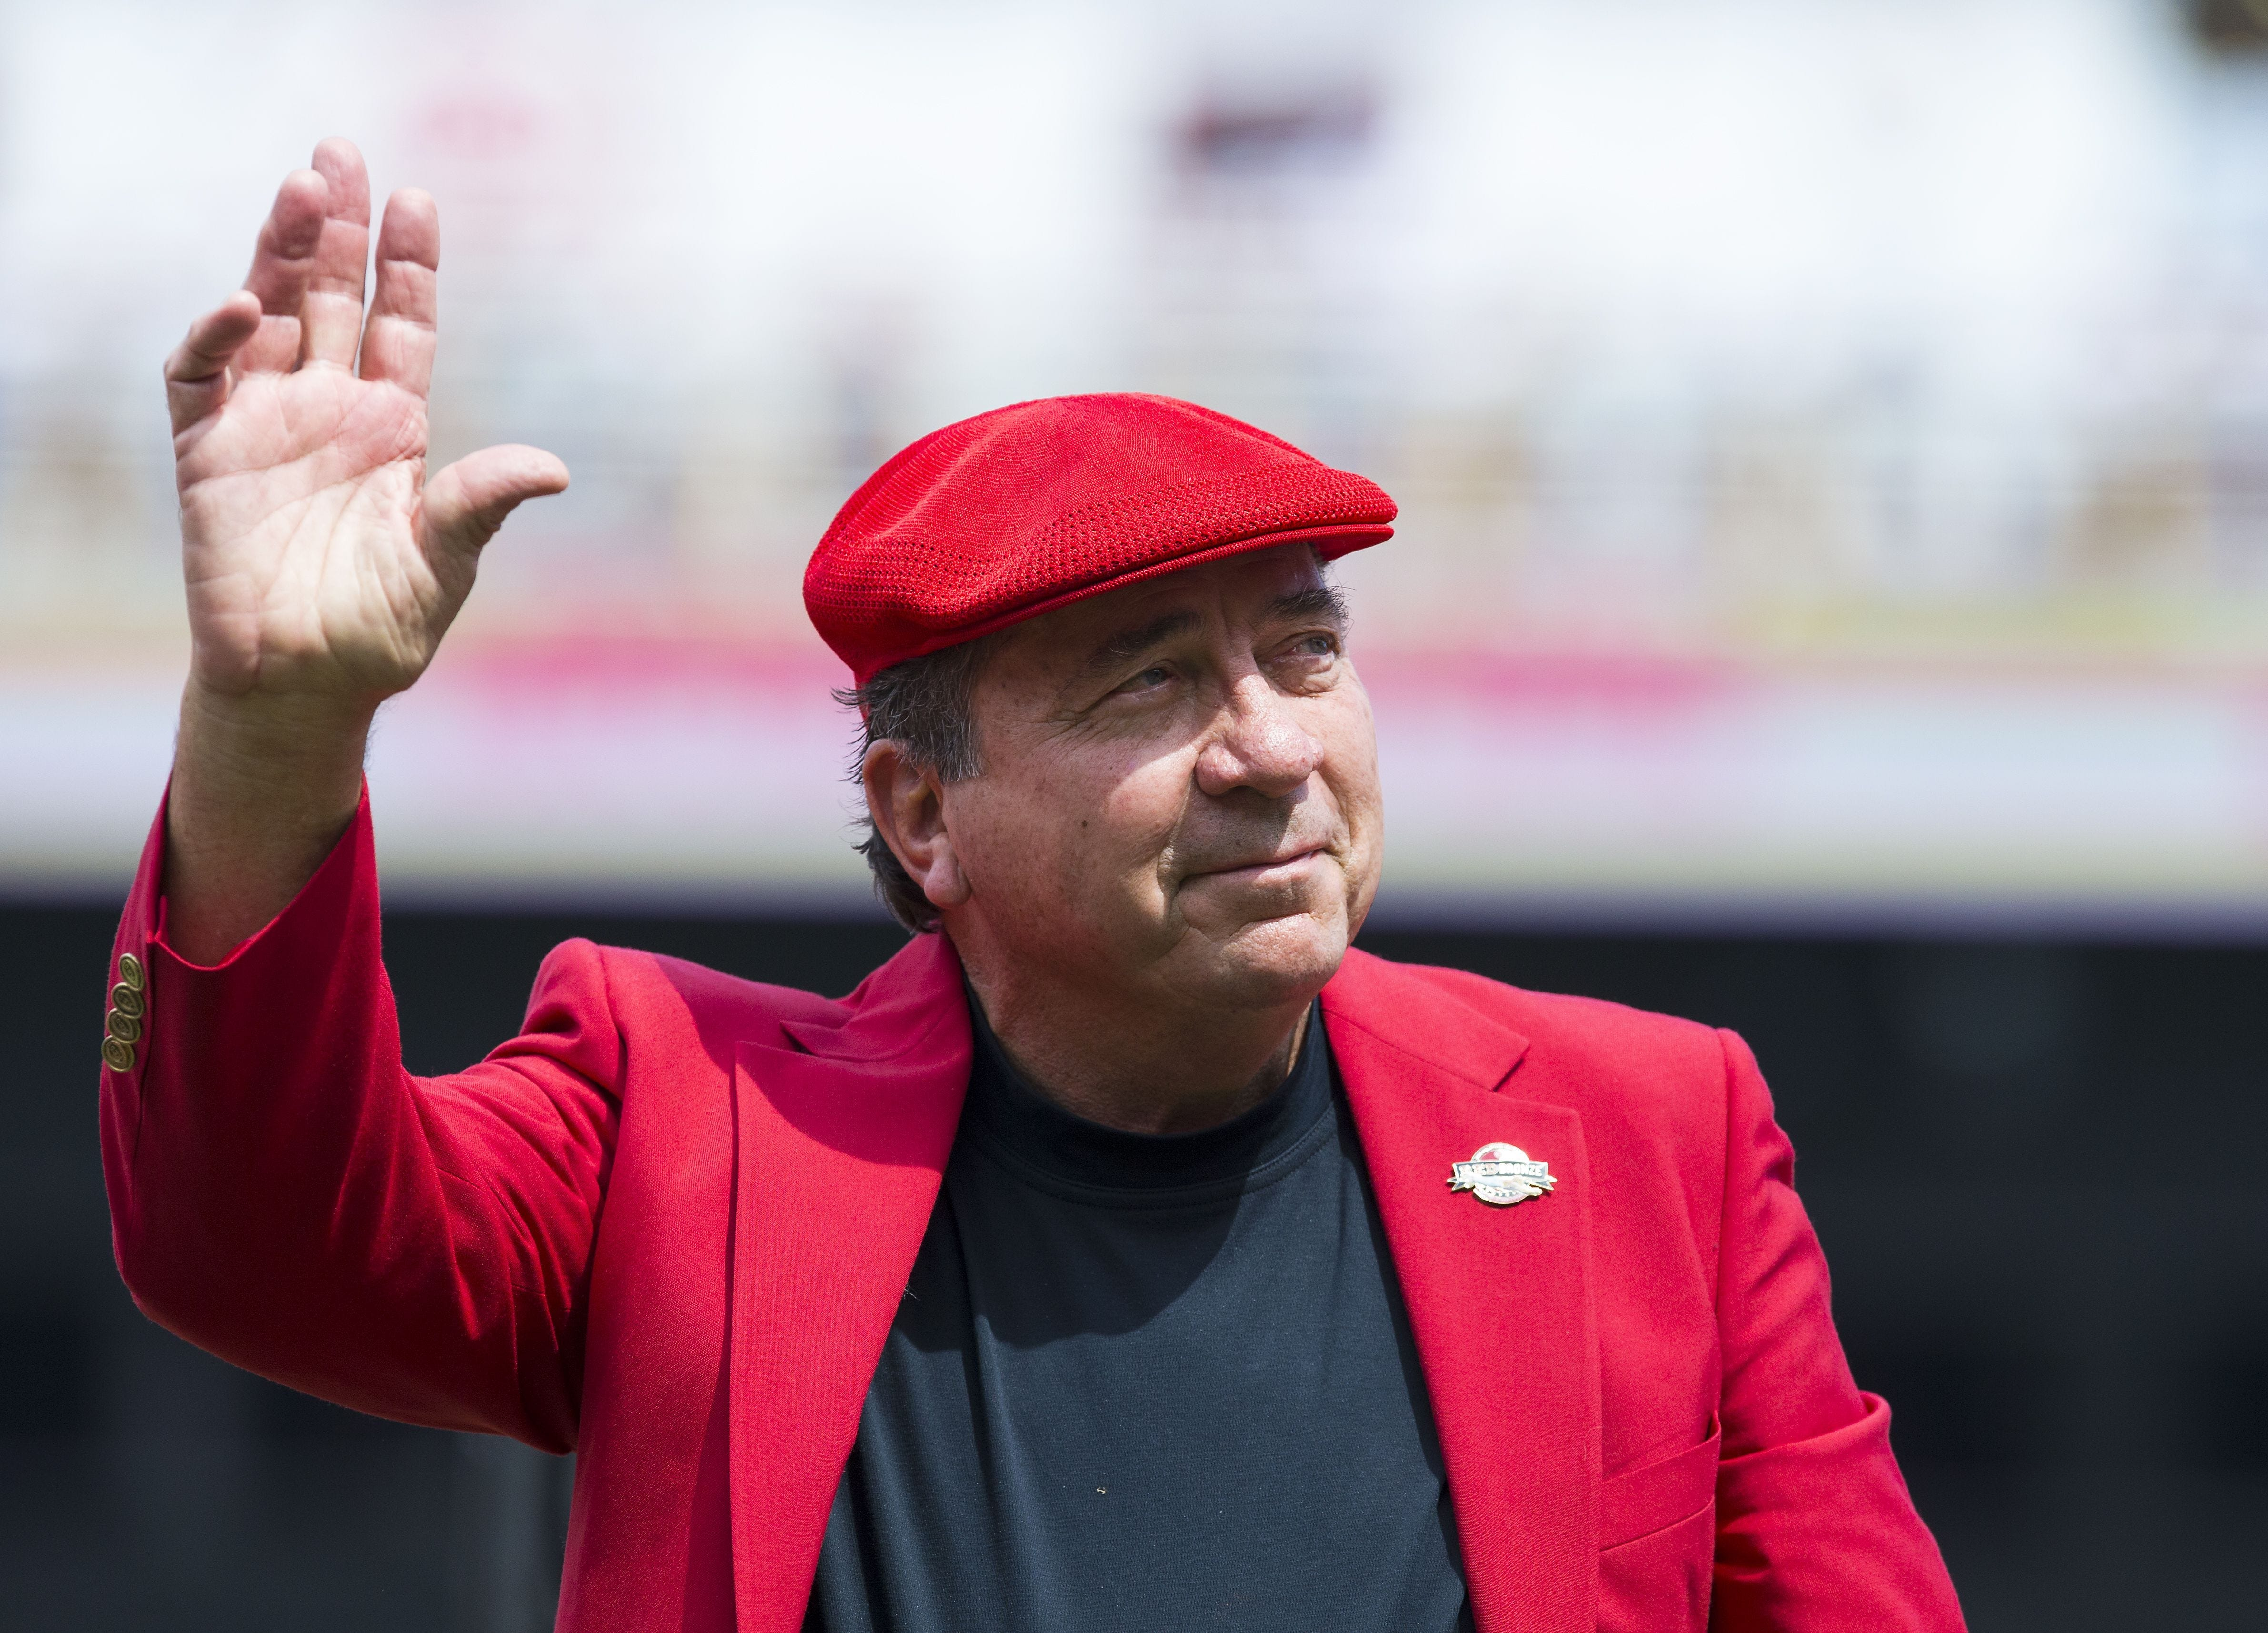 Cincinnati Reds legend auctioned off memorabilia